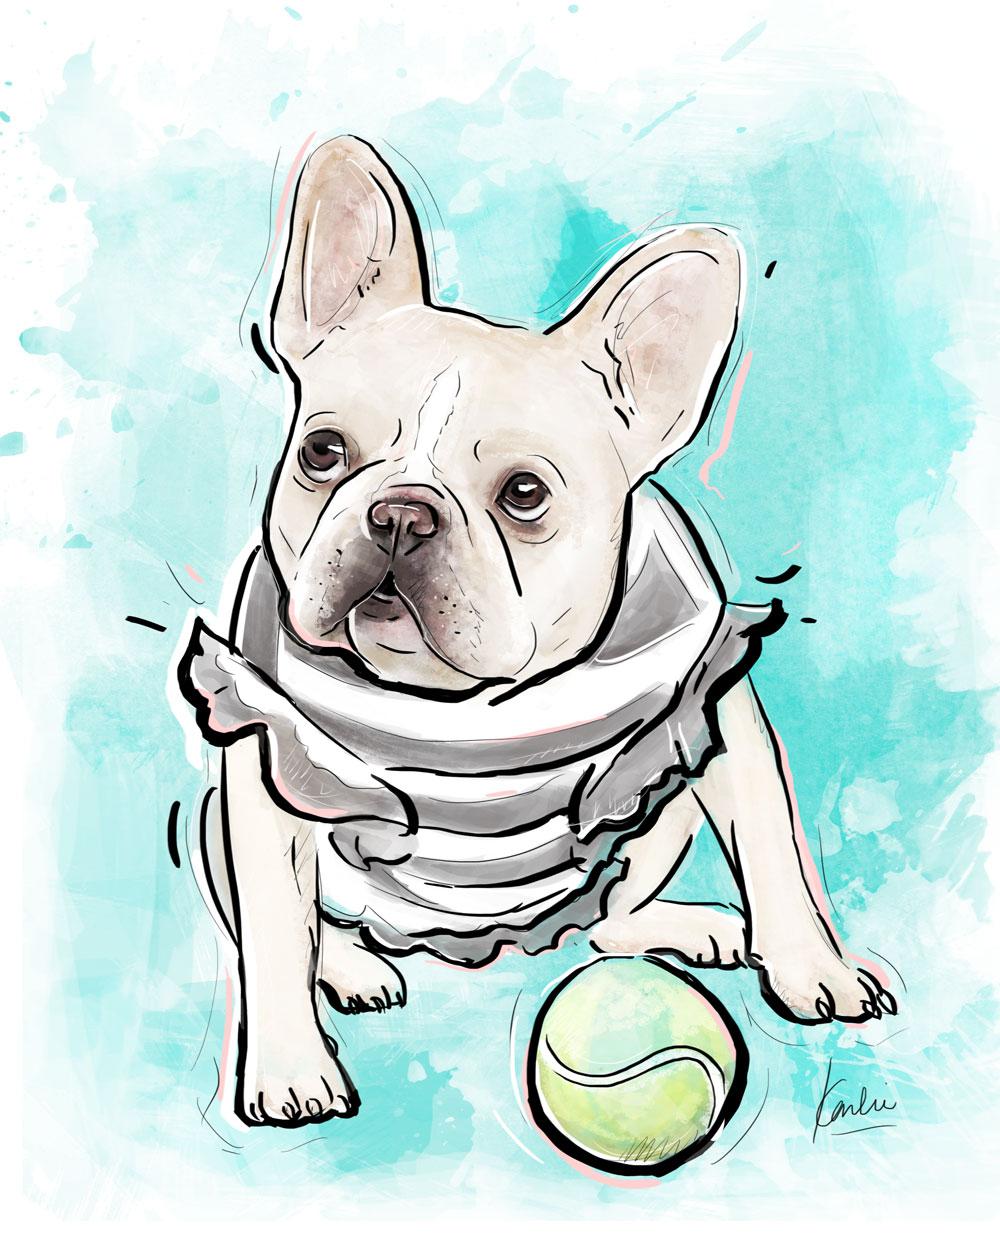 Pet Illustration: custom dog portrait commissioned artwork | Murrow the Frenchie - mixed media